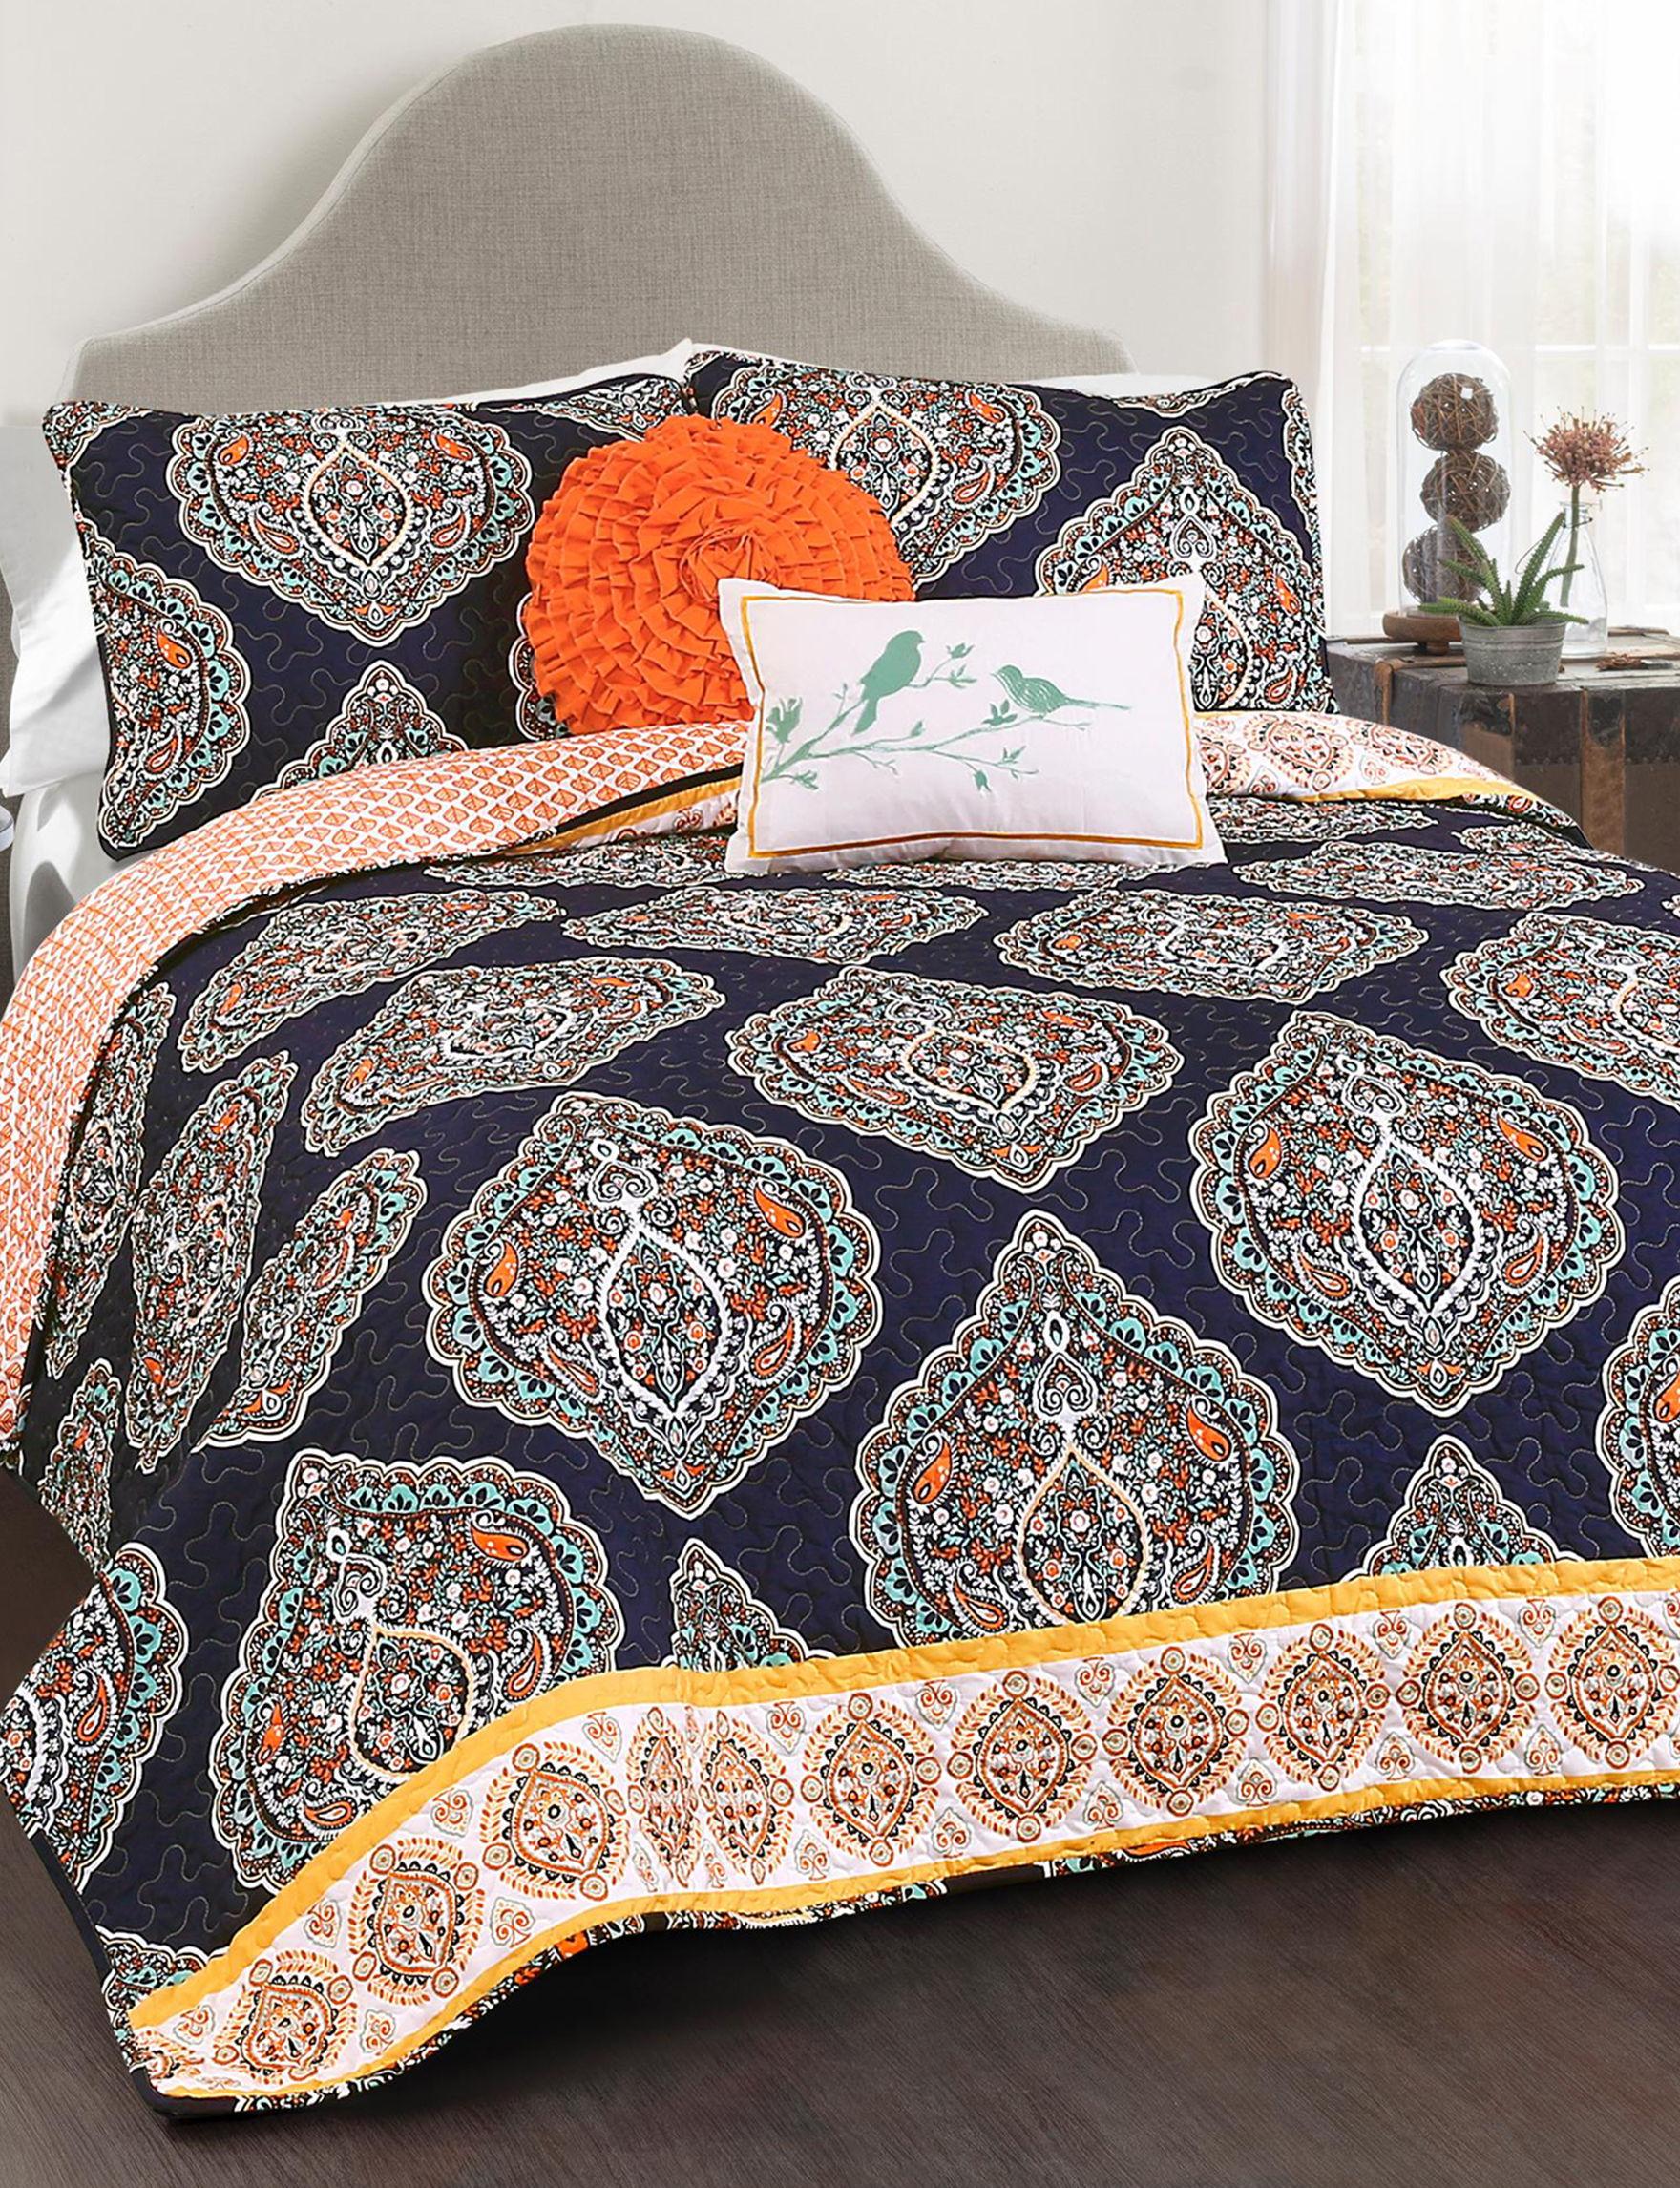 Lush Decor Navy Quilts & Quilt Sets